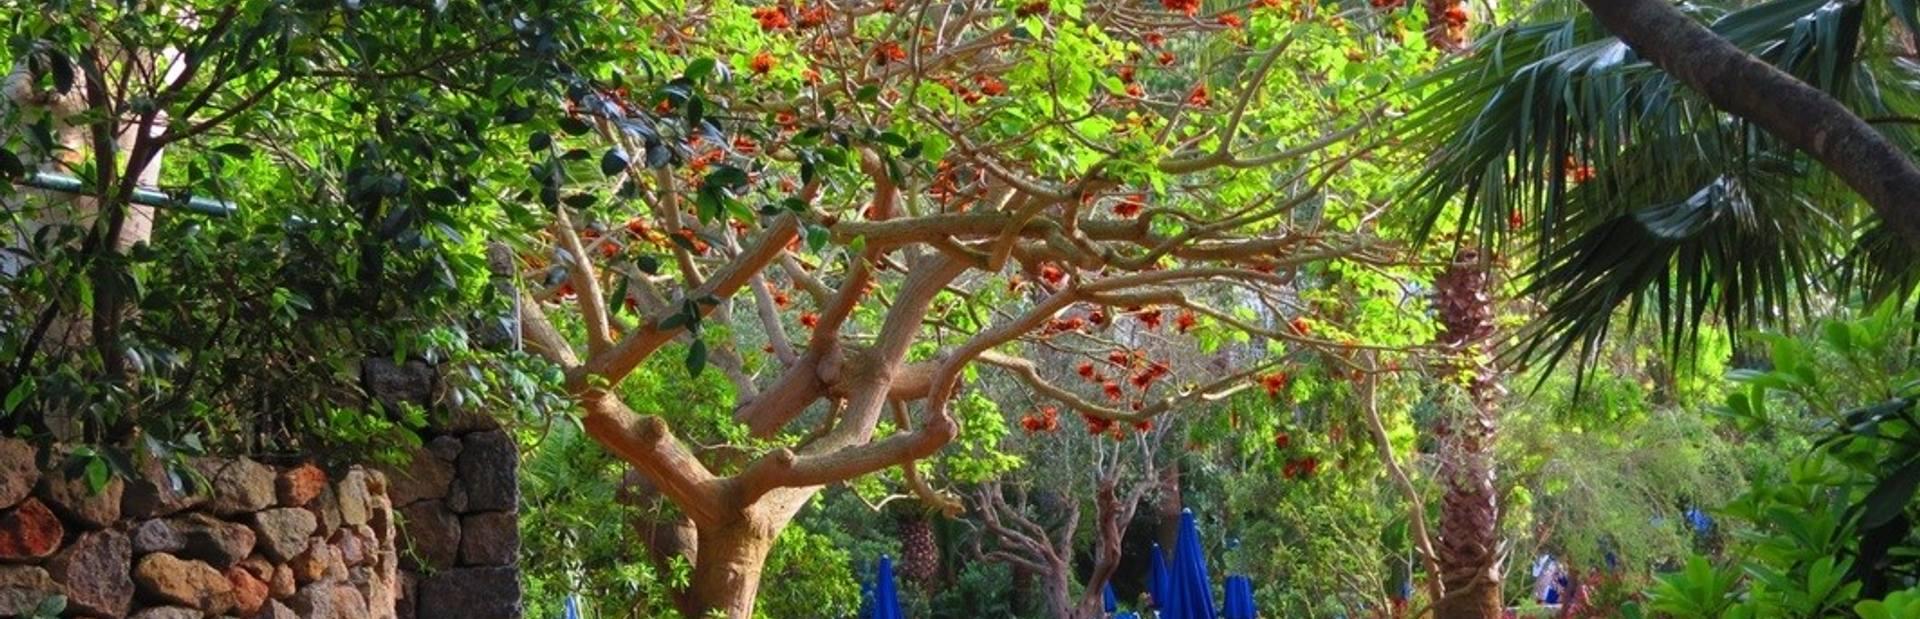 Negombo Thermal Gardens Image 1